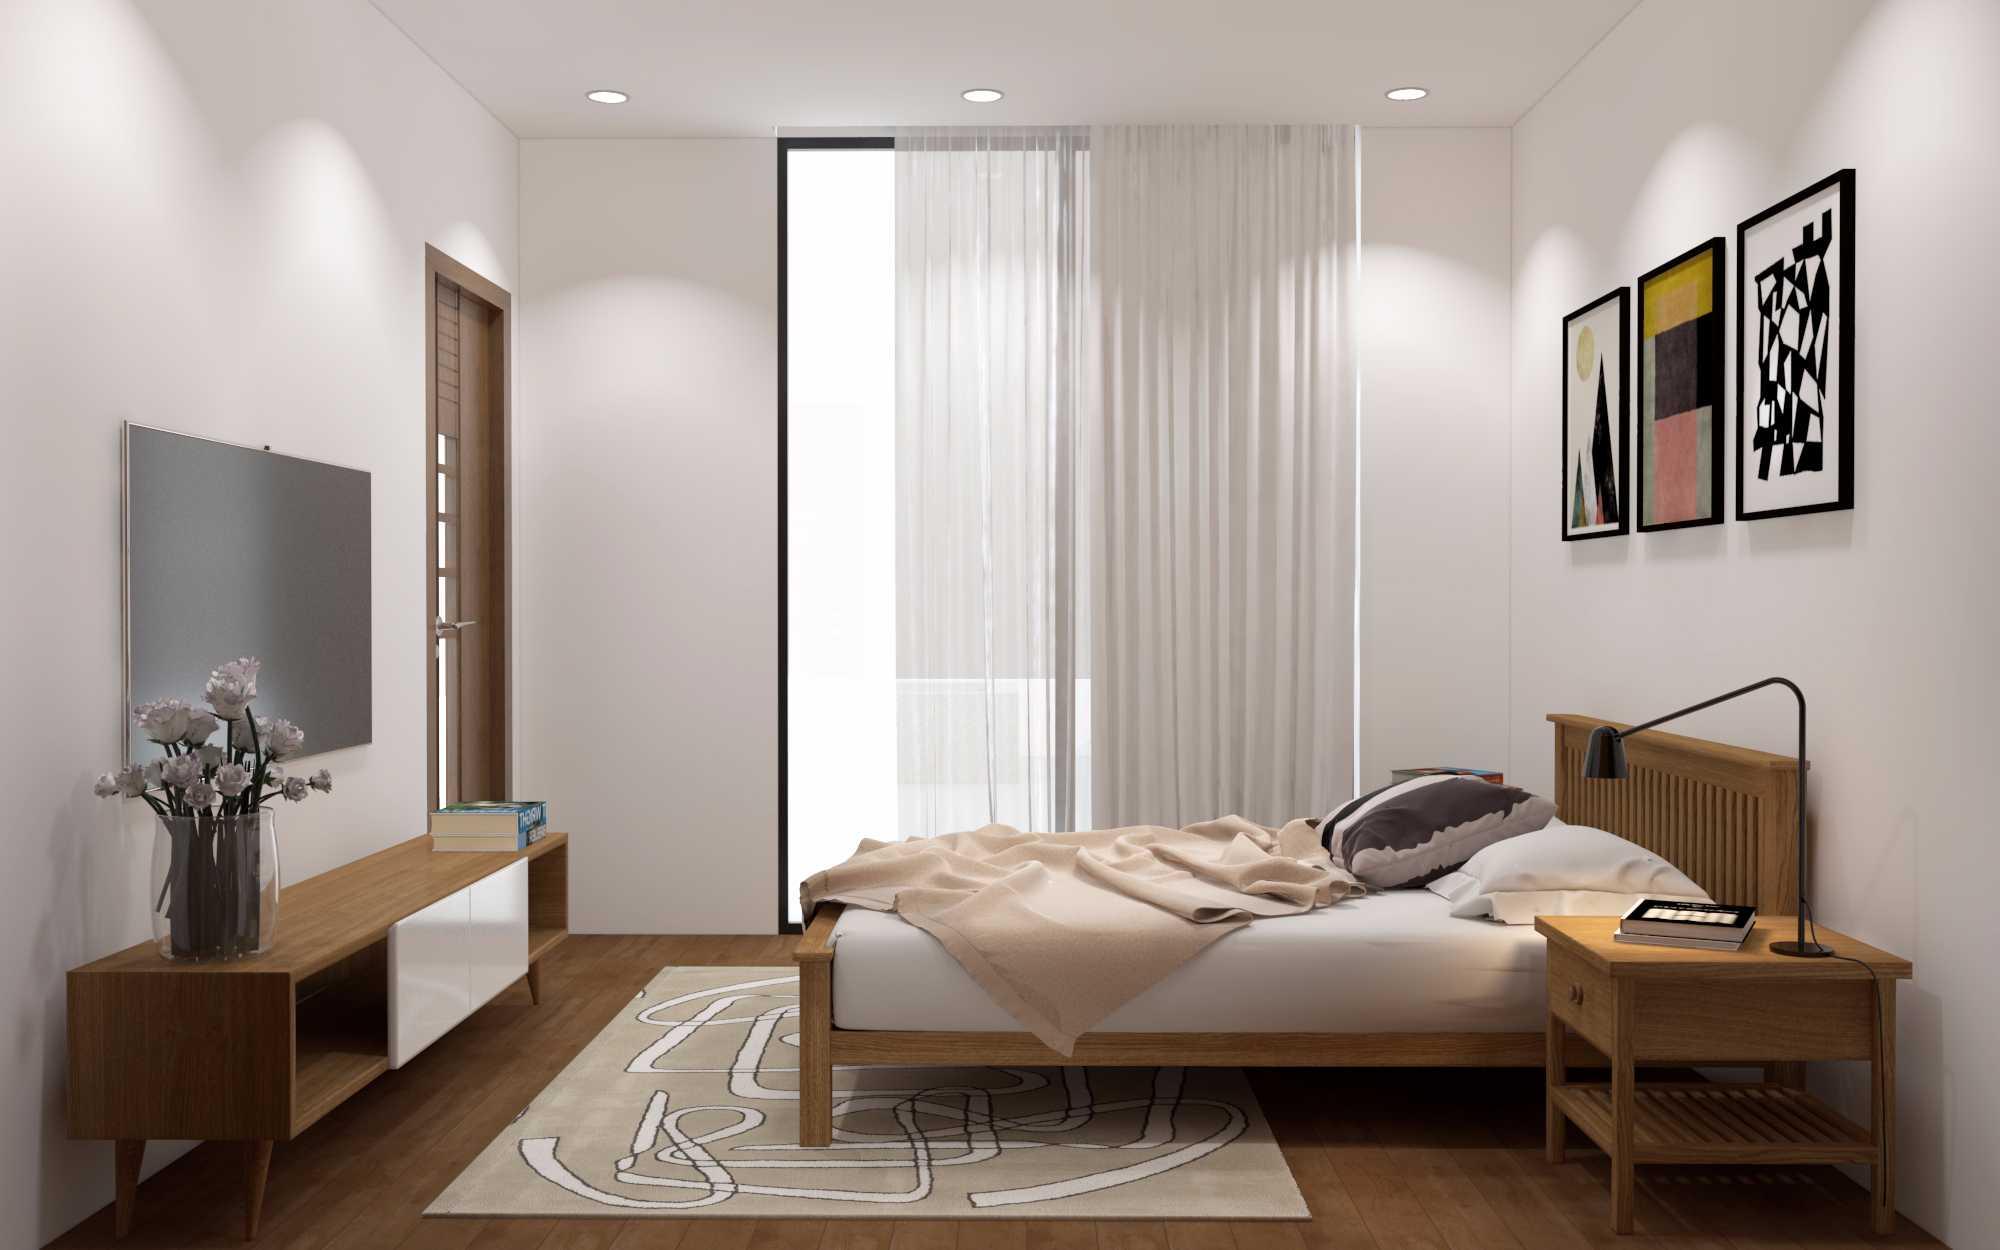 P.NGU 2 TANG 2 01 1 Dự án Sunny Garden Resort